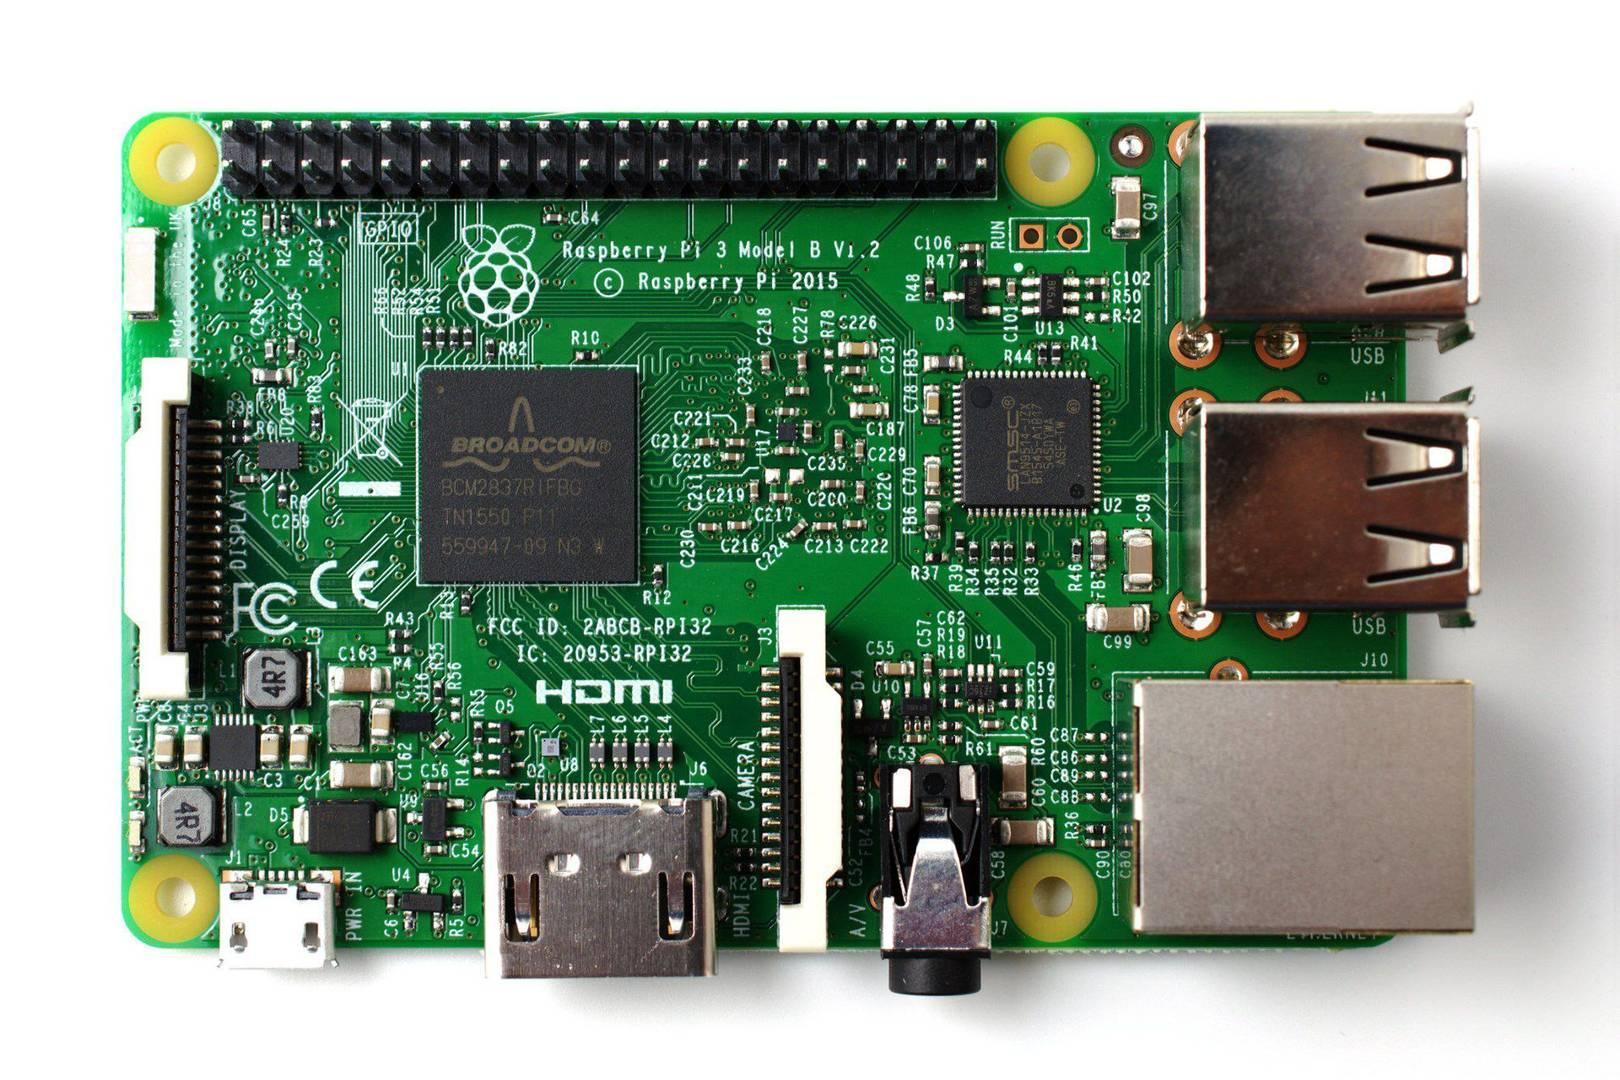 Raspberry Pi 3 Bluetooth 64bit 1.2GHz Quad Core New 2016 Wifi Model B